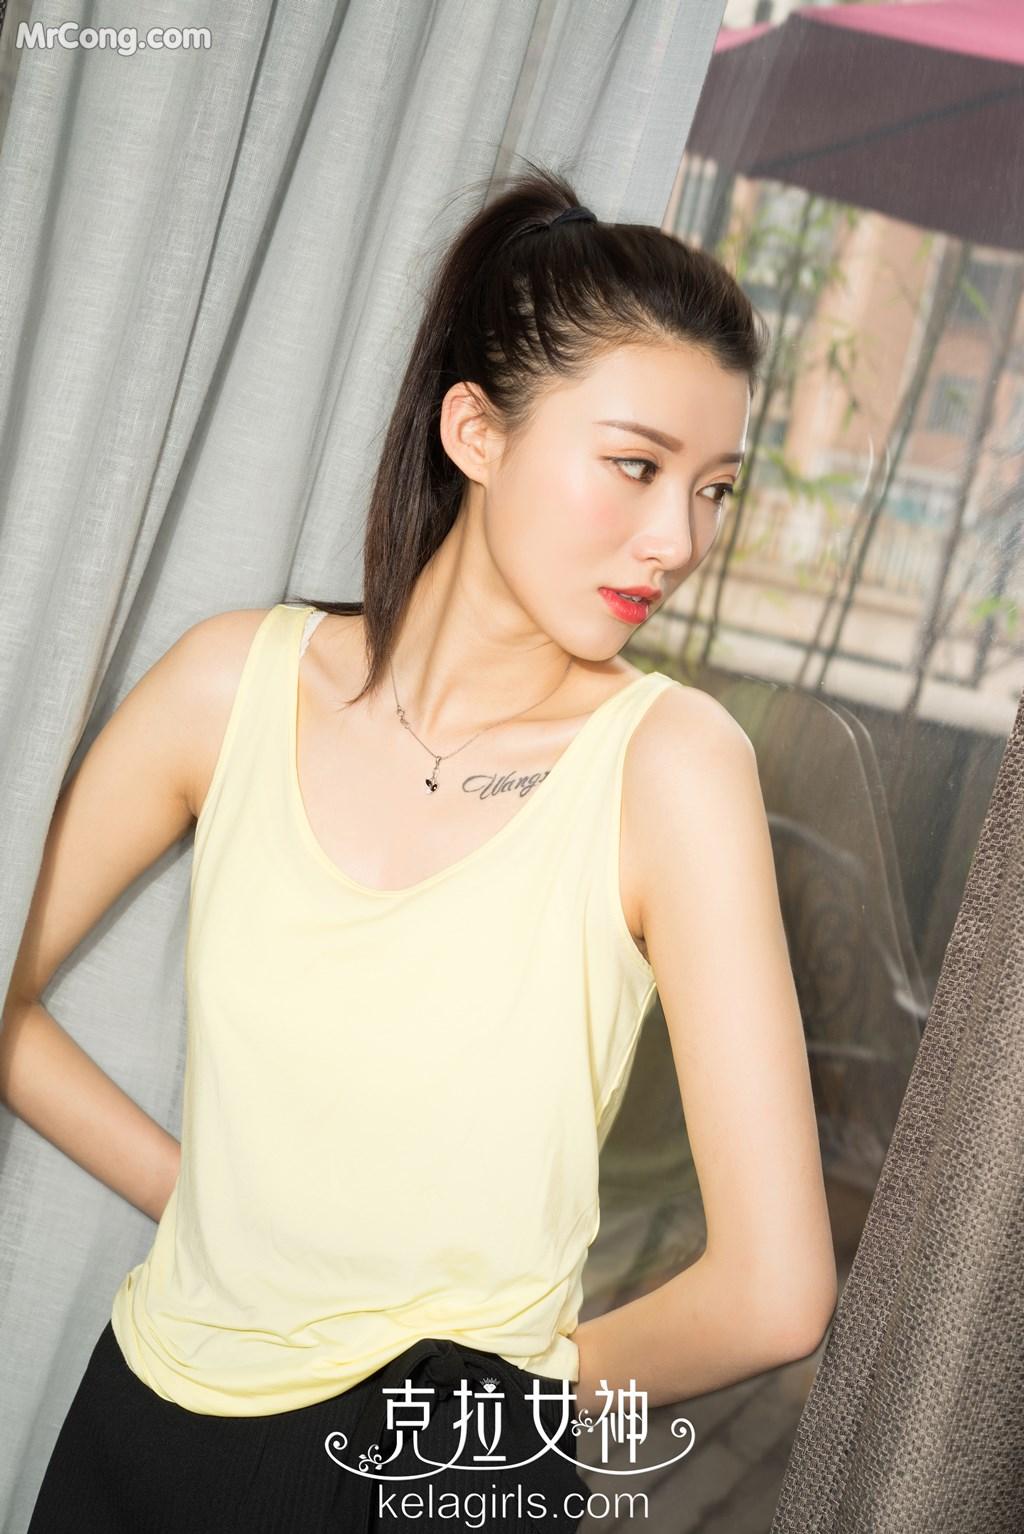 Image KelaGirls-2017-08-09-Zhao-Yujing-MrCong.com-003 in post KelaGirls 2017-08-09: Người mẫu Zhao Yujing (赵雨静) (21 ảnh)